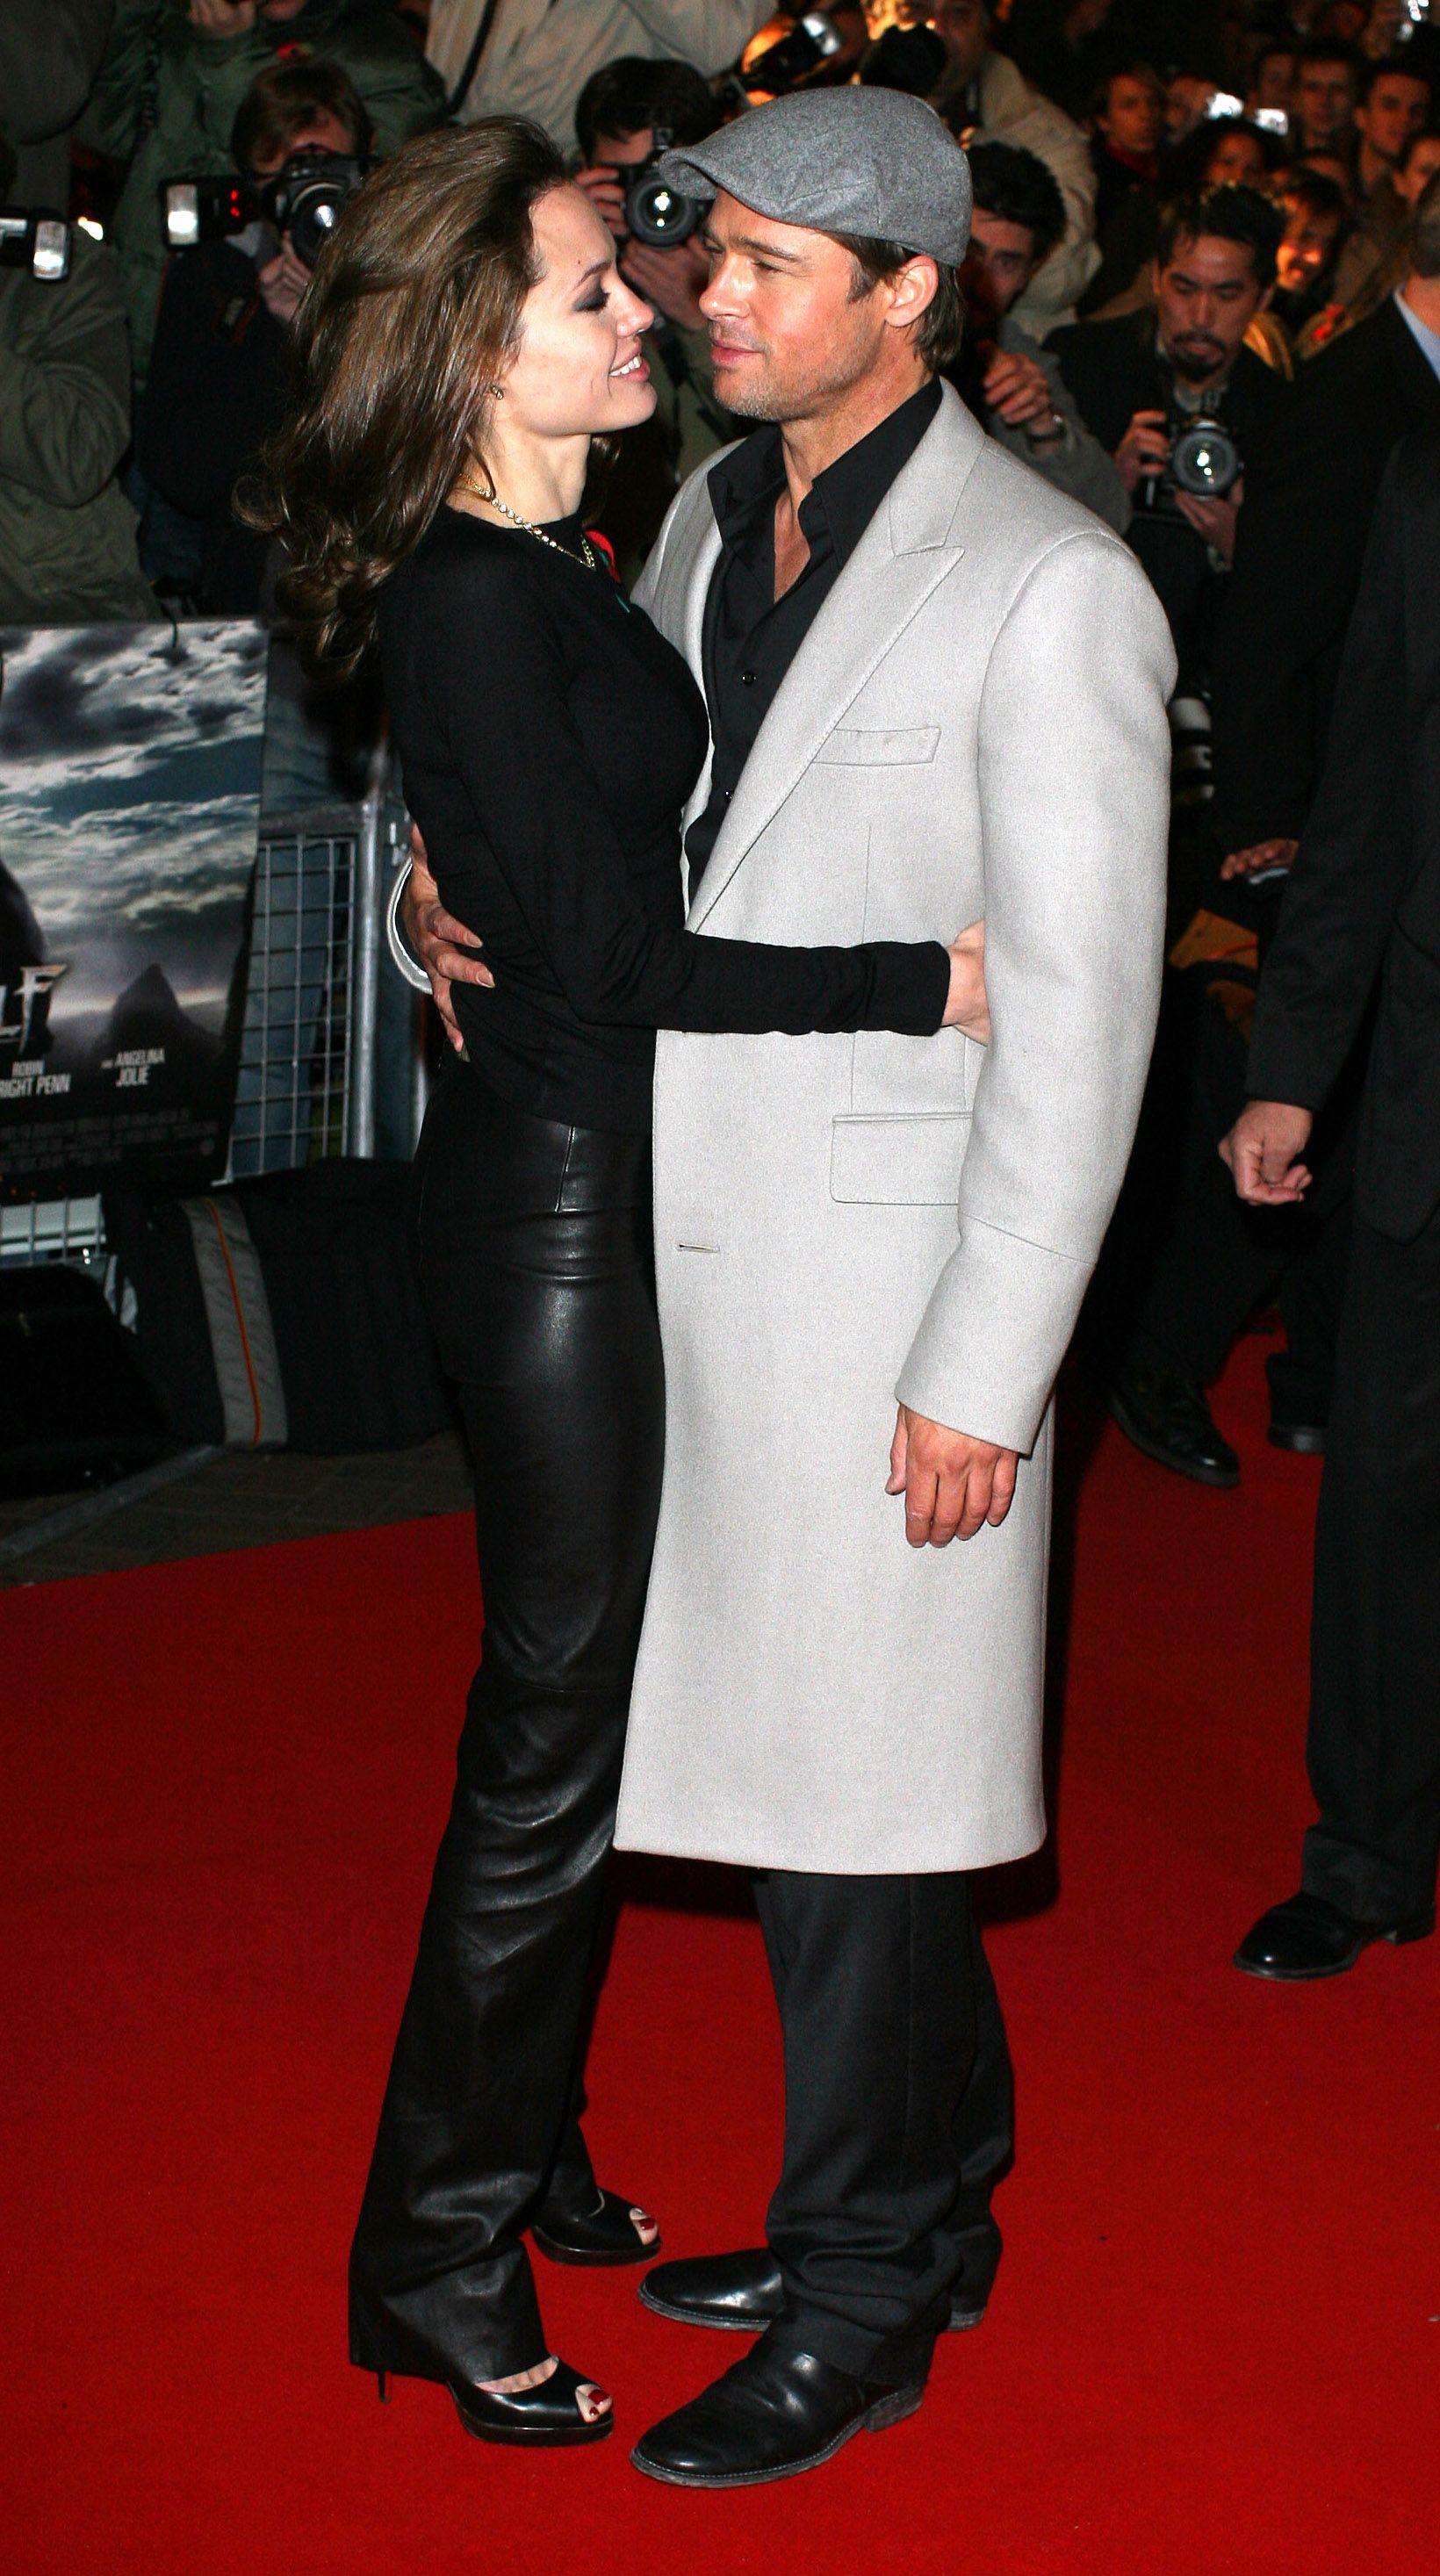 40 Times Brad Pitt And Angelina Jolie Were A Painfully Adorable Couple Angelina Jolie Brad Pitt And Angelina Jolie Angelina And Brad Pitt